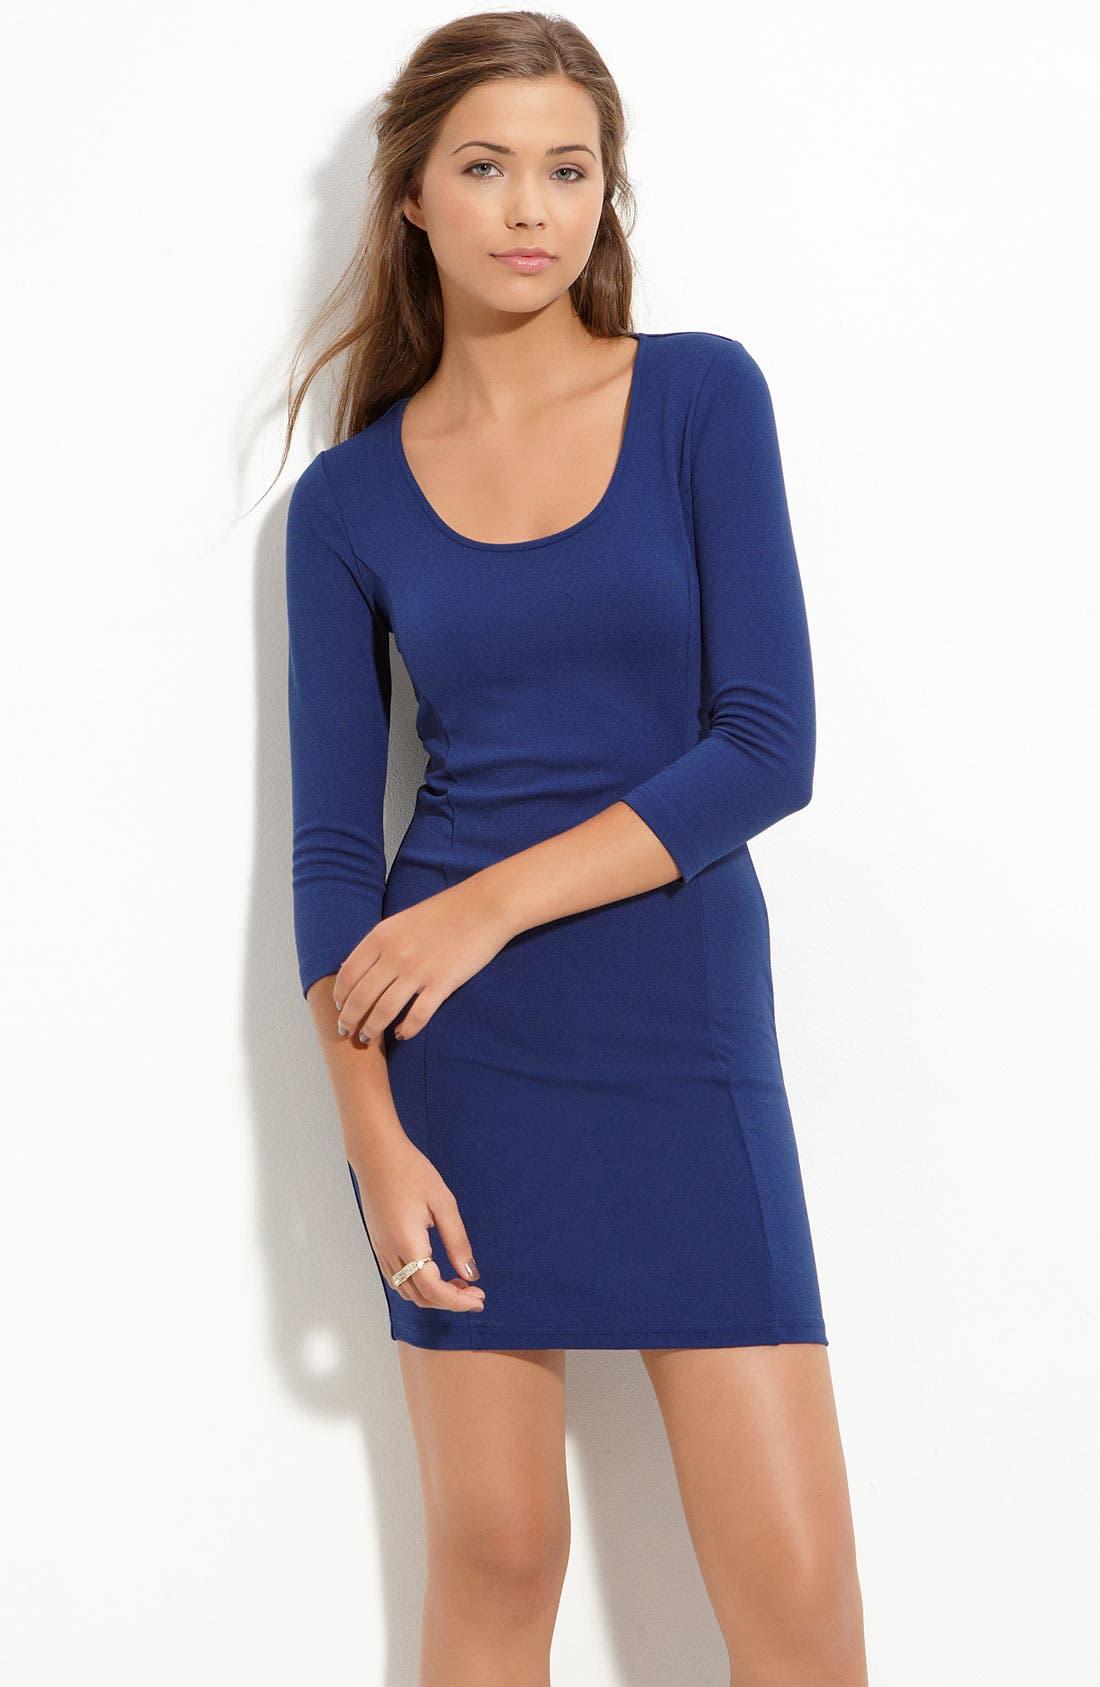 Alternate Image 1 Selected - Frenchi® Back Cutout Knit Dress (Juniors)